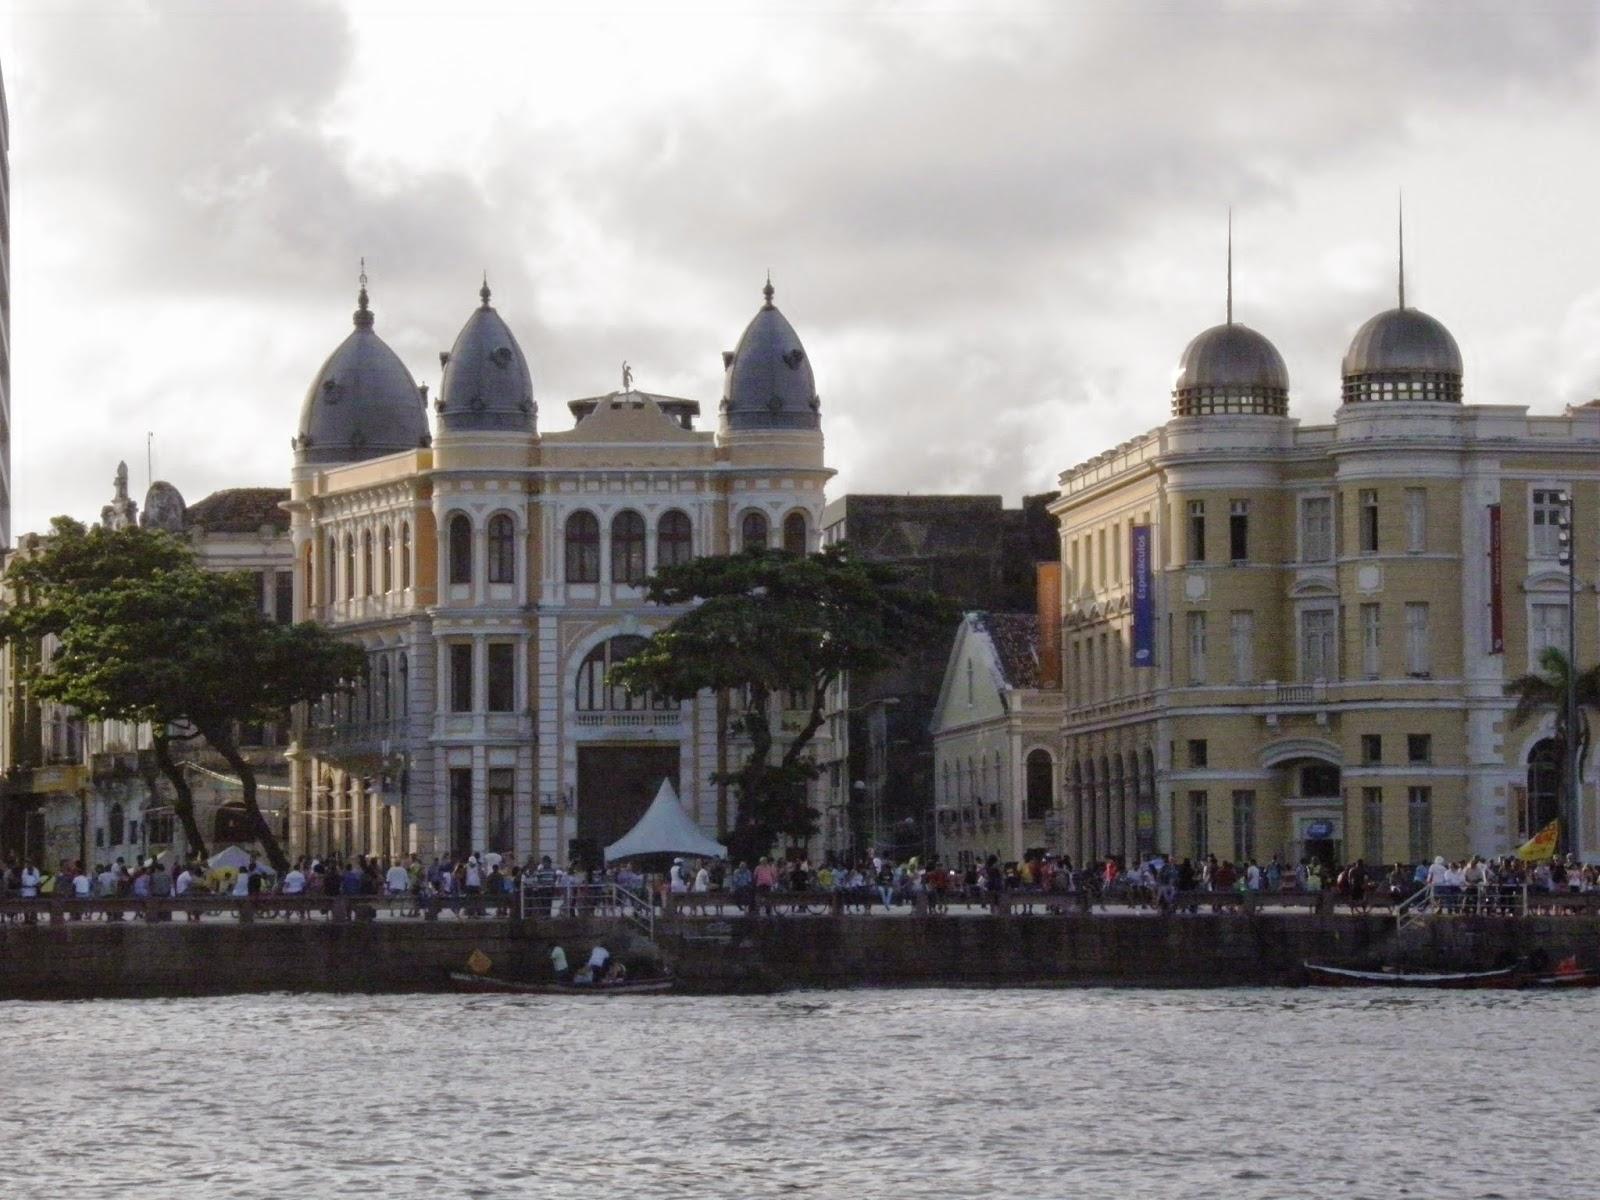 RECIFE; TURISMO; PASSEIO DE BARCO; PASSEIO DE CATAMARÃ; RIO CAPIBARIBE